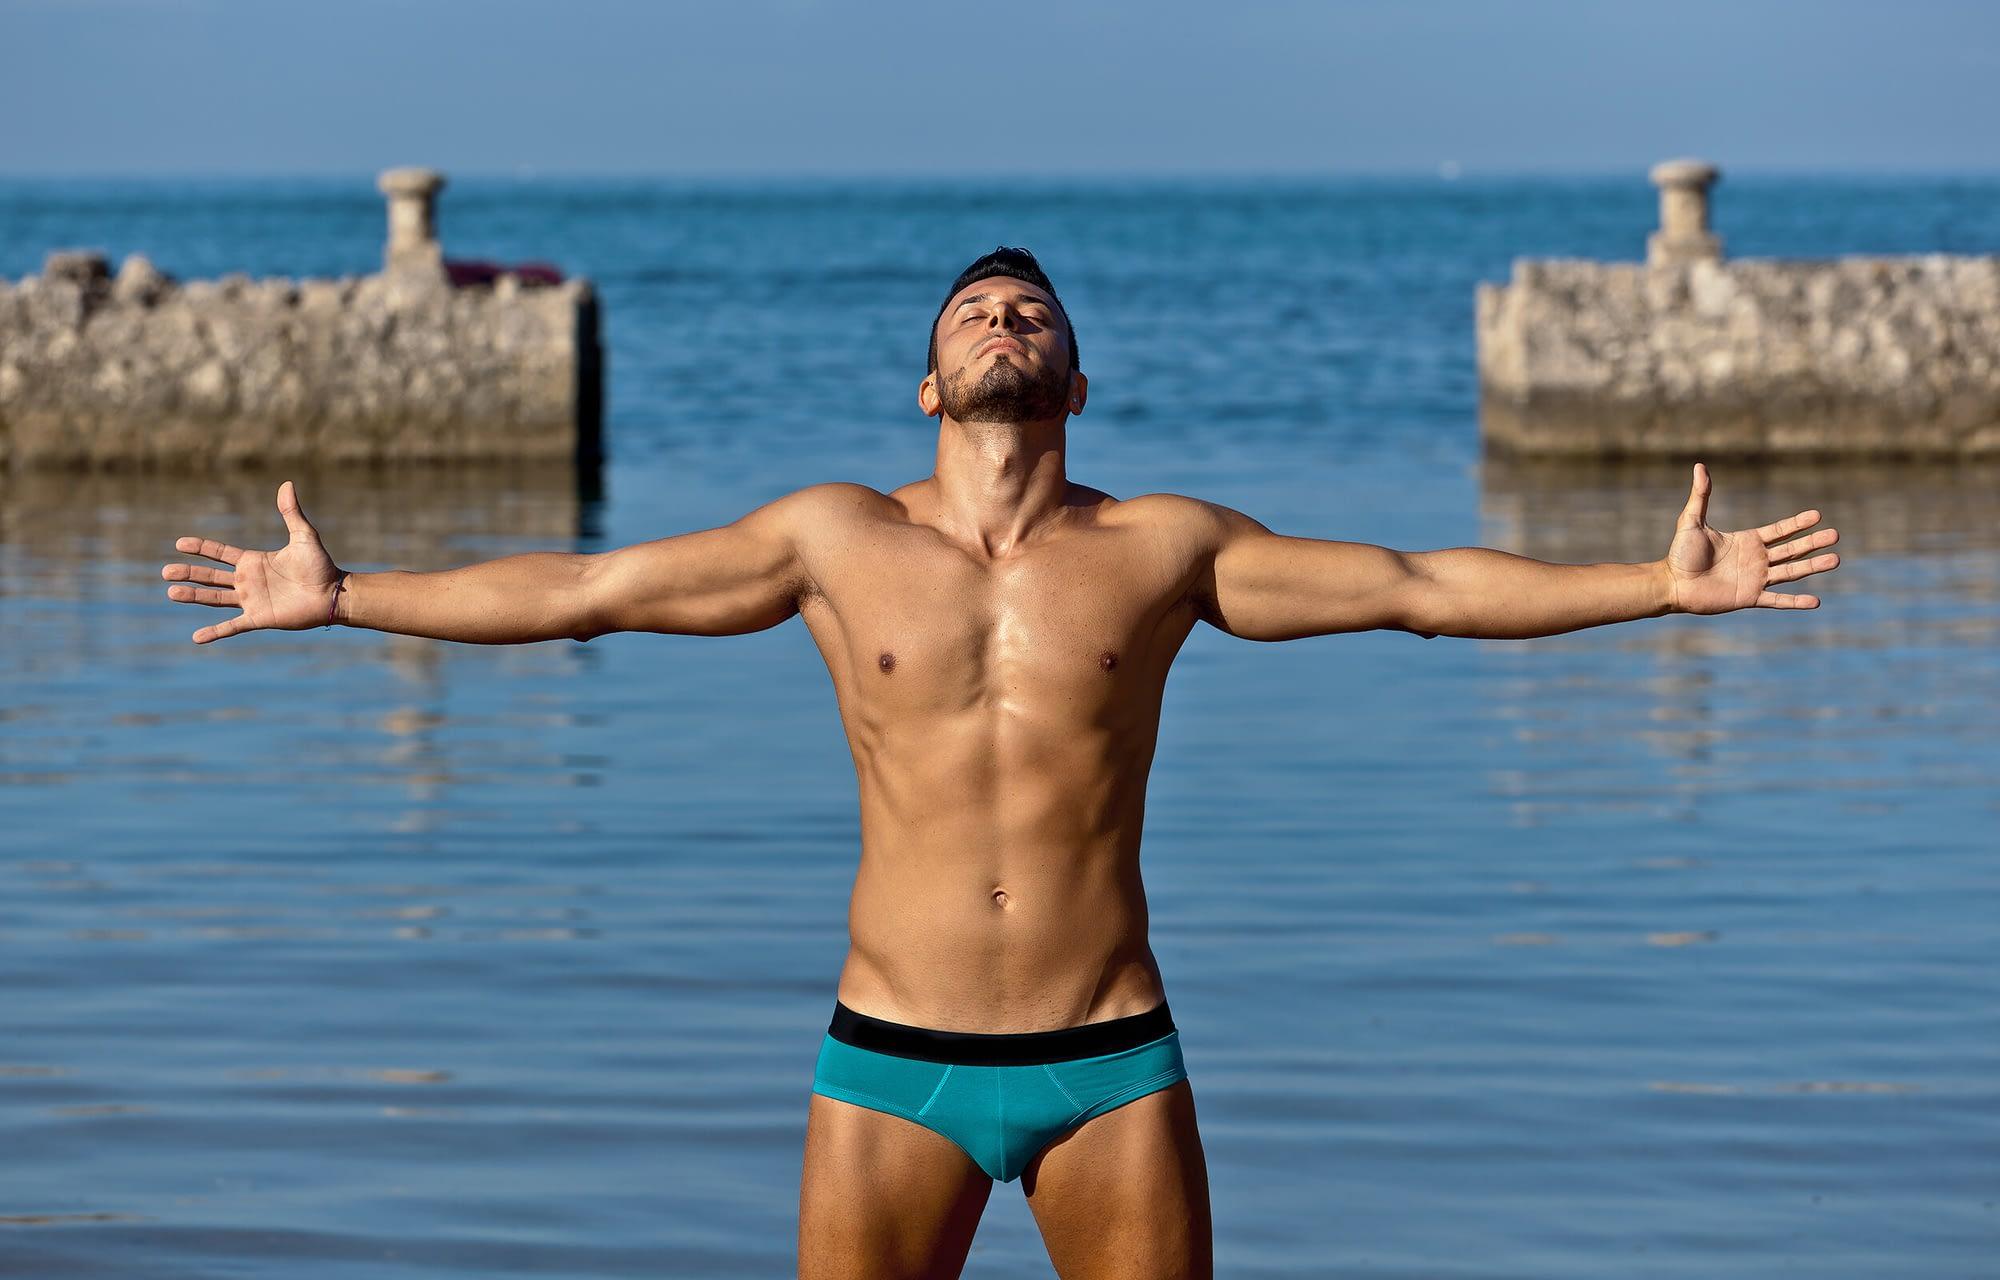 16 Things Hot Guys Do That We Love!